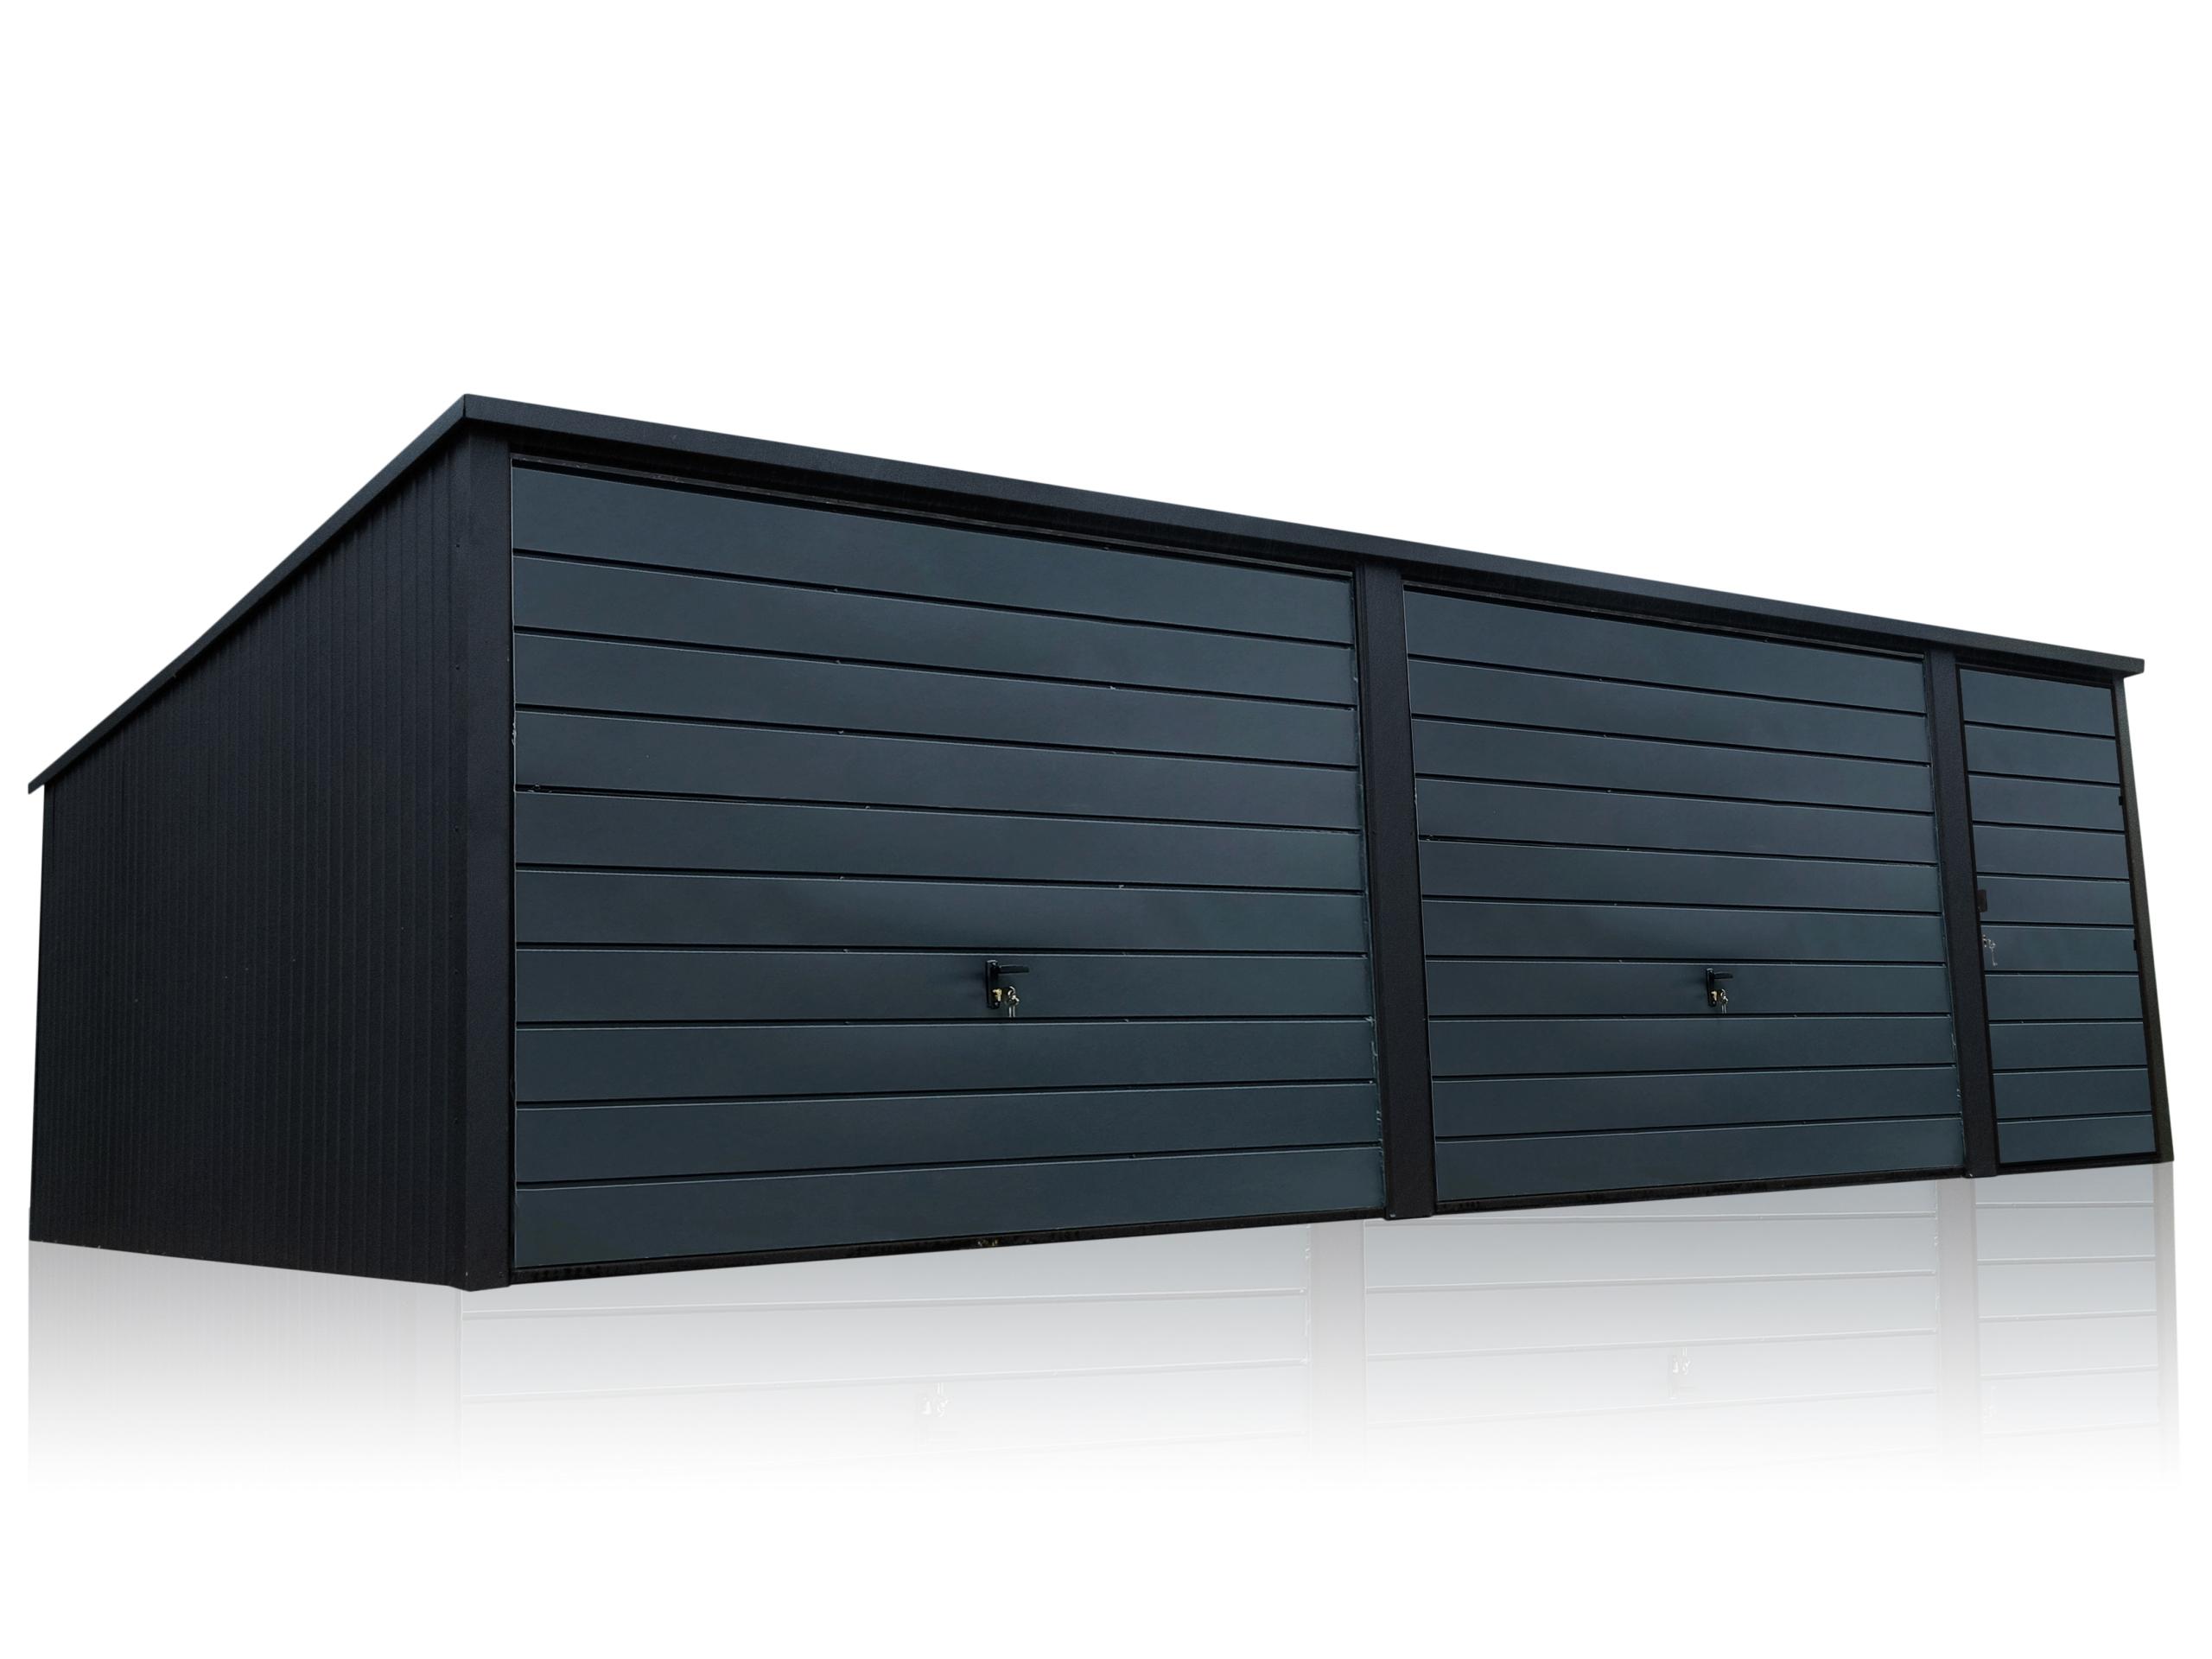 Металлический гараж 7x5м Premium Graphite Matte Black